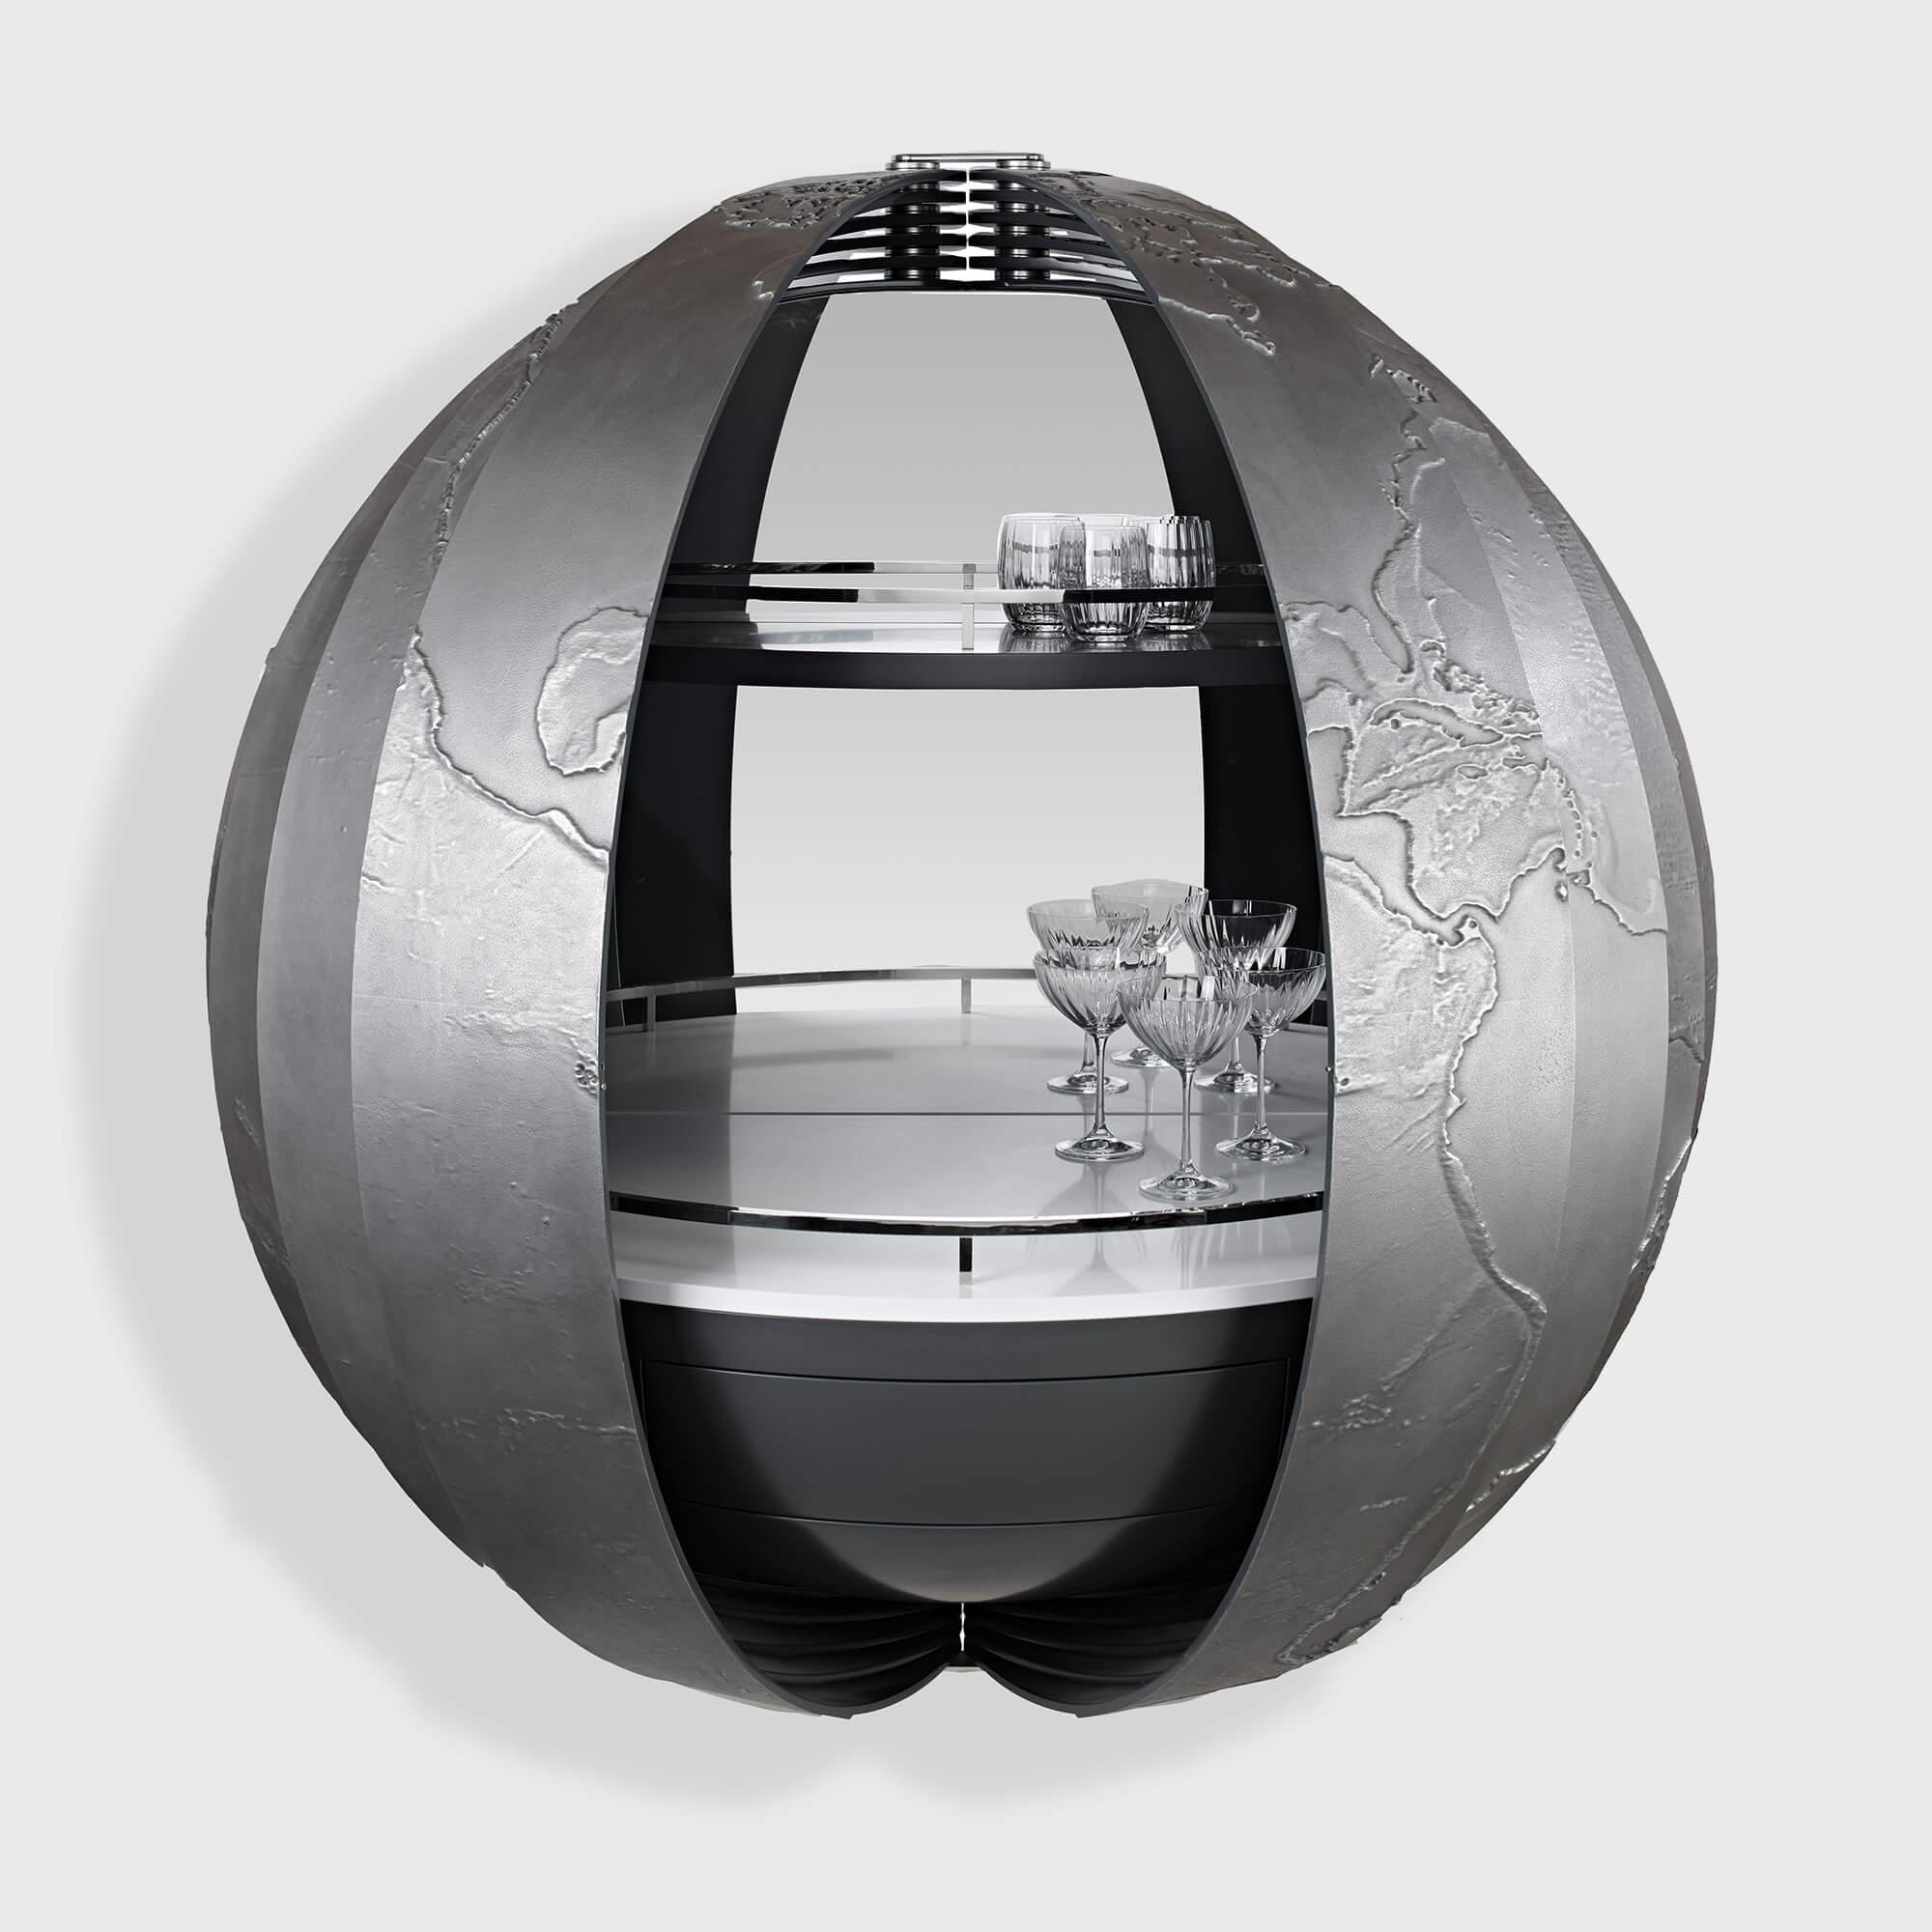 Custom globe drinks cabinet created by Splinterworks for Scout super yacht.